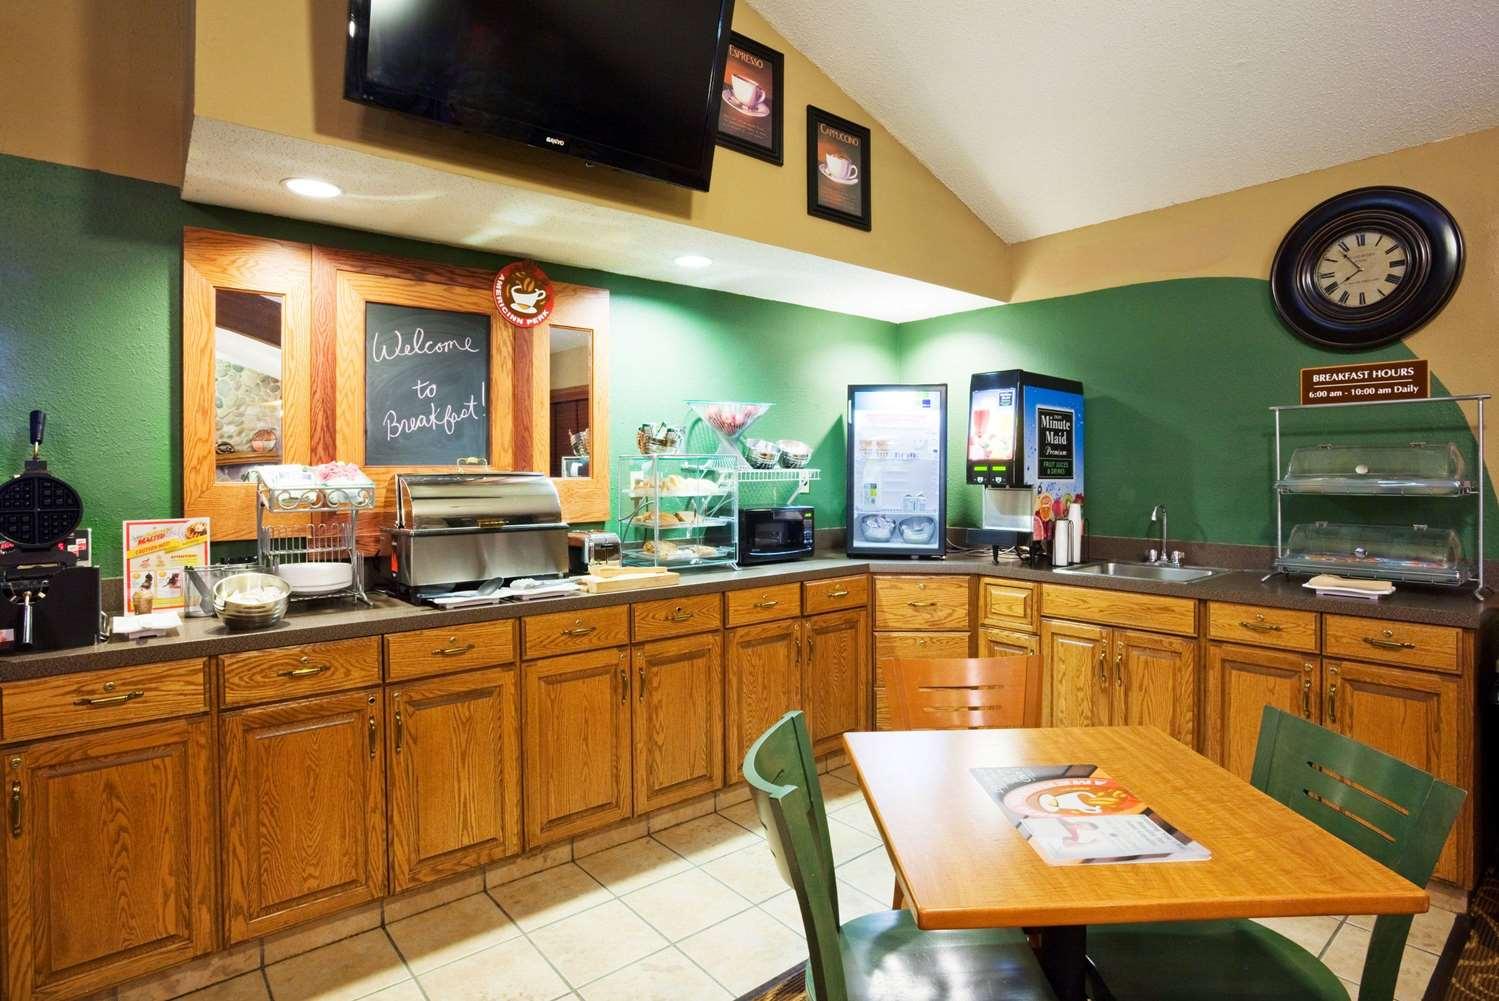 proam - AmericInn Lodge & Suites Austin